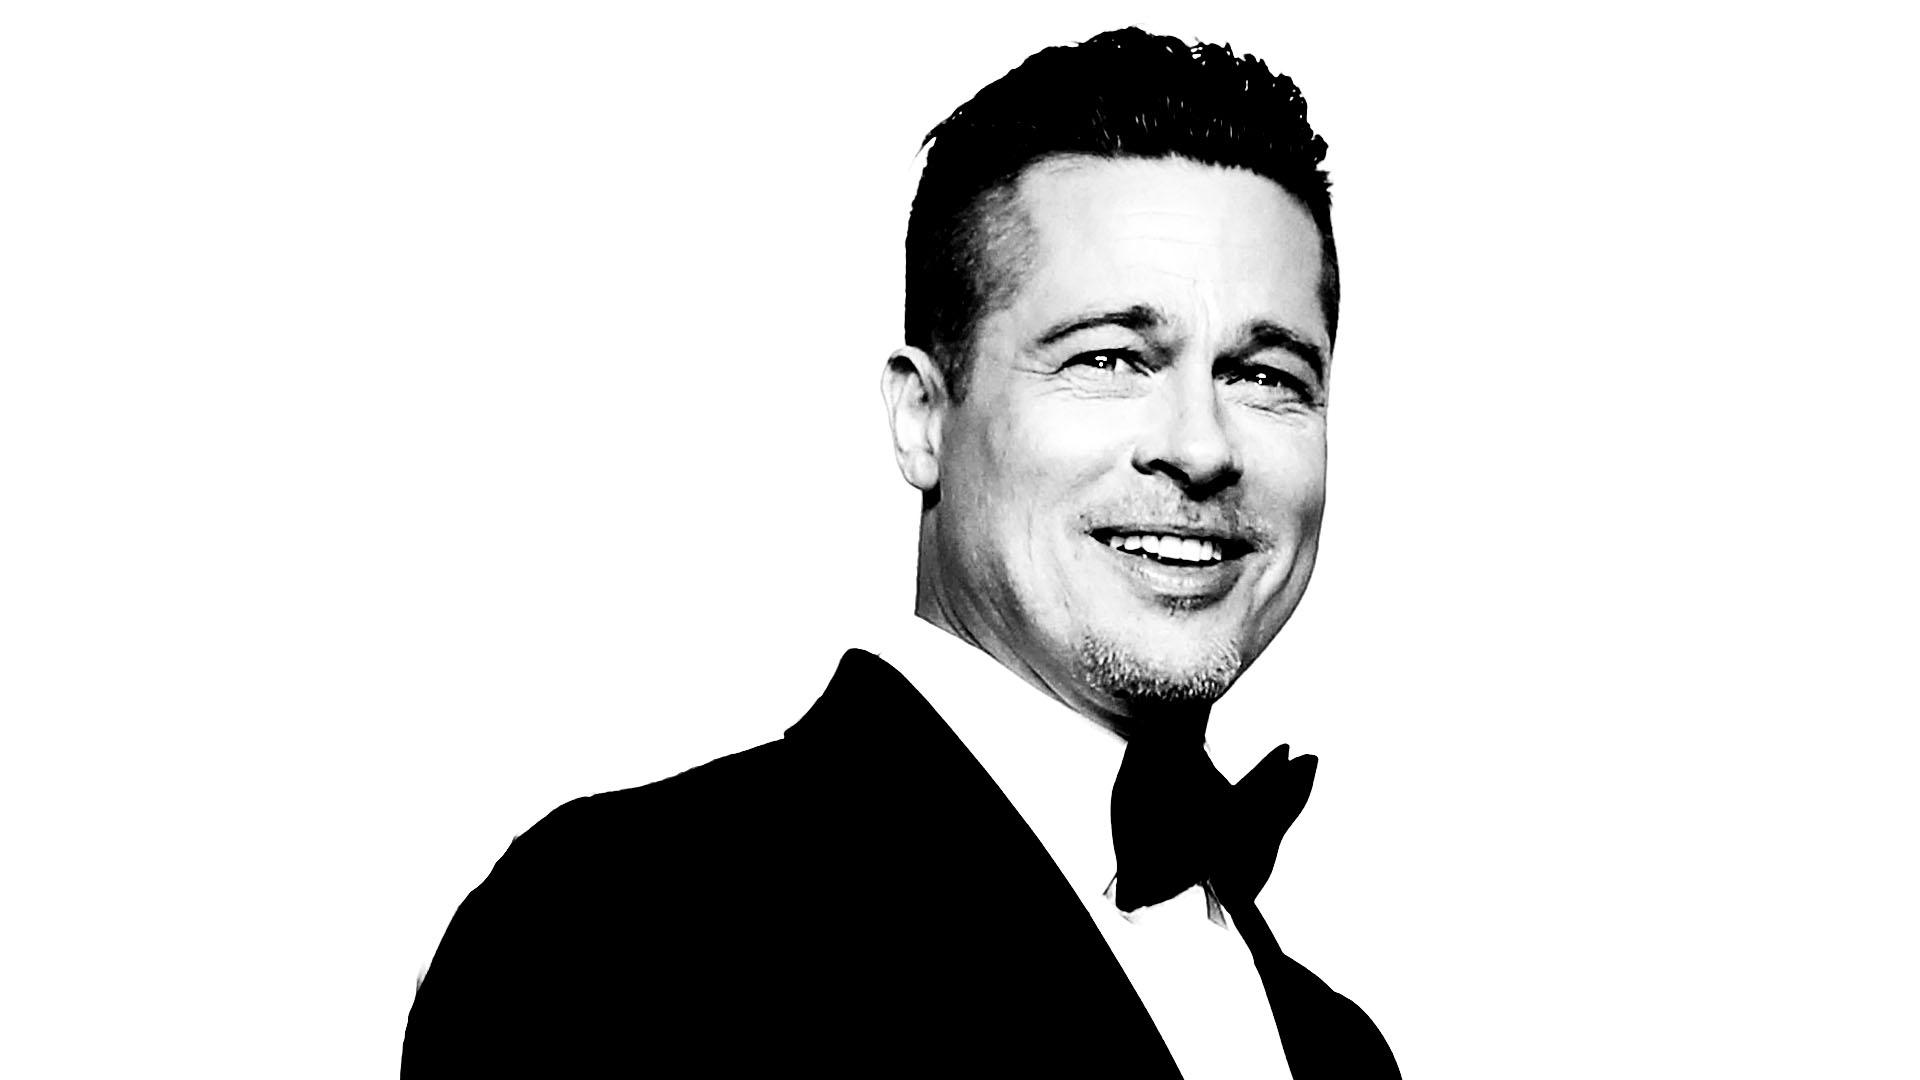 Brad Pitt Background Download 1920x1080